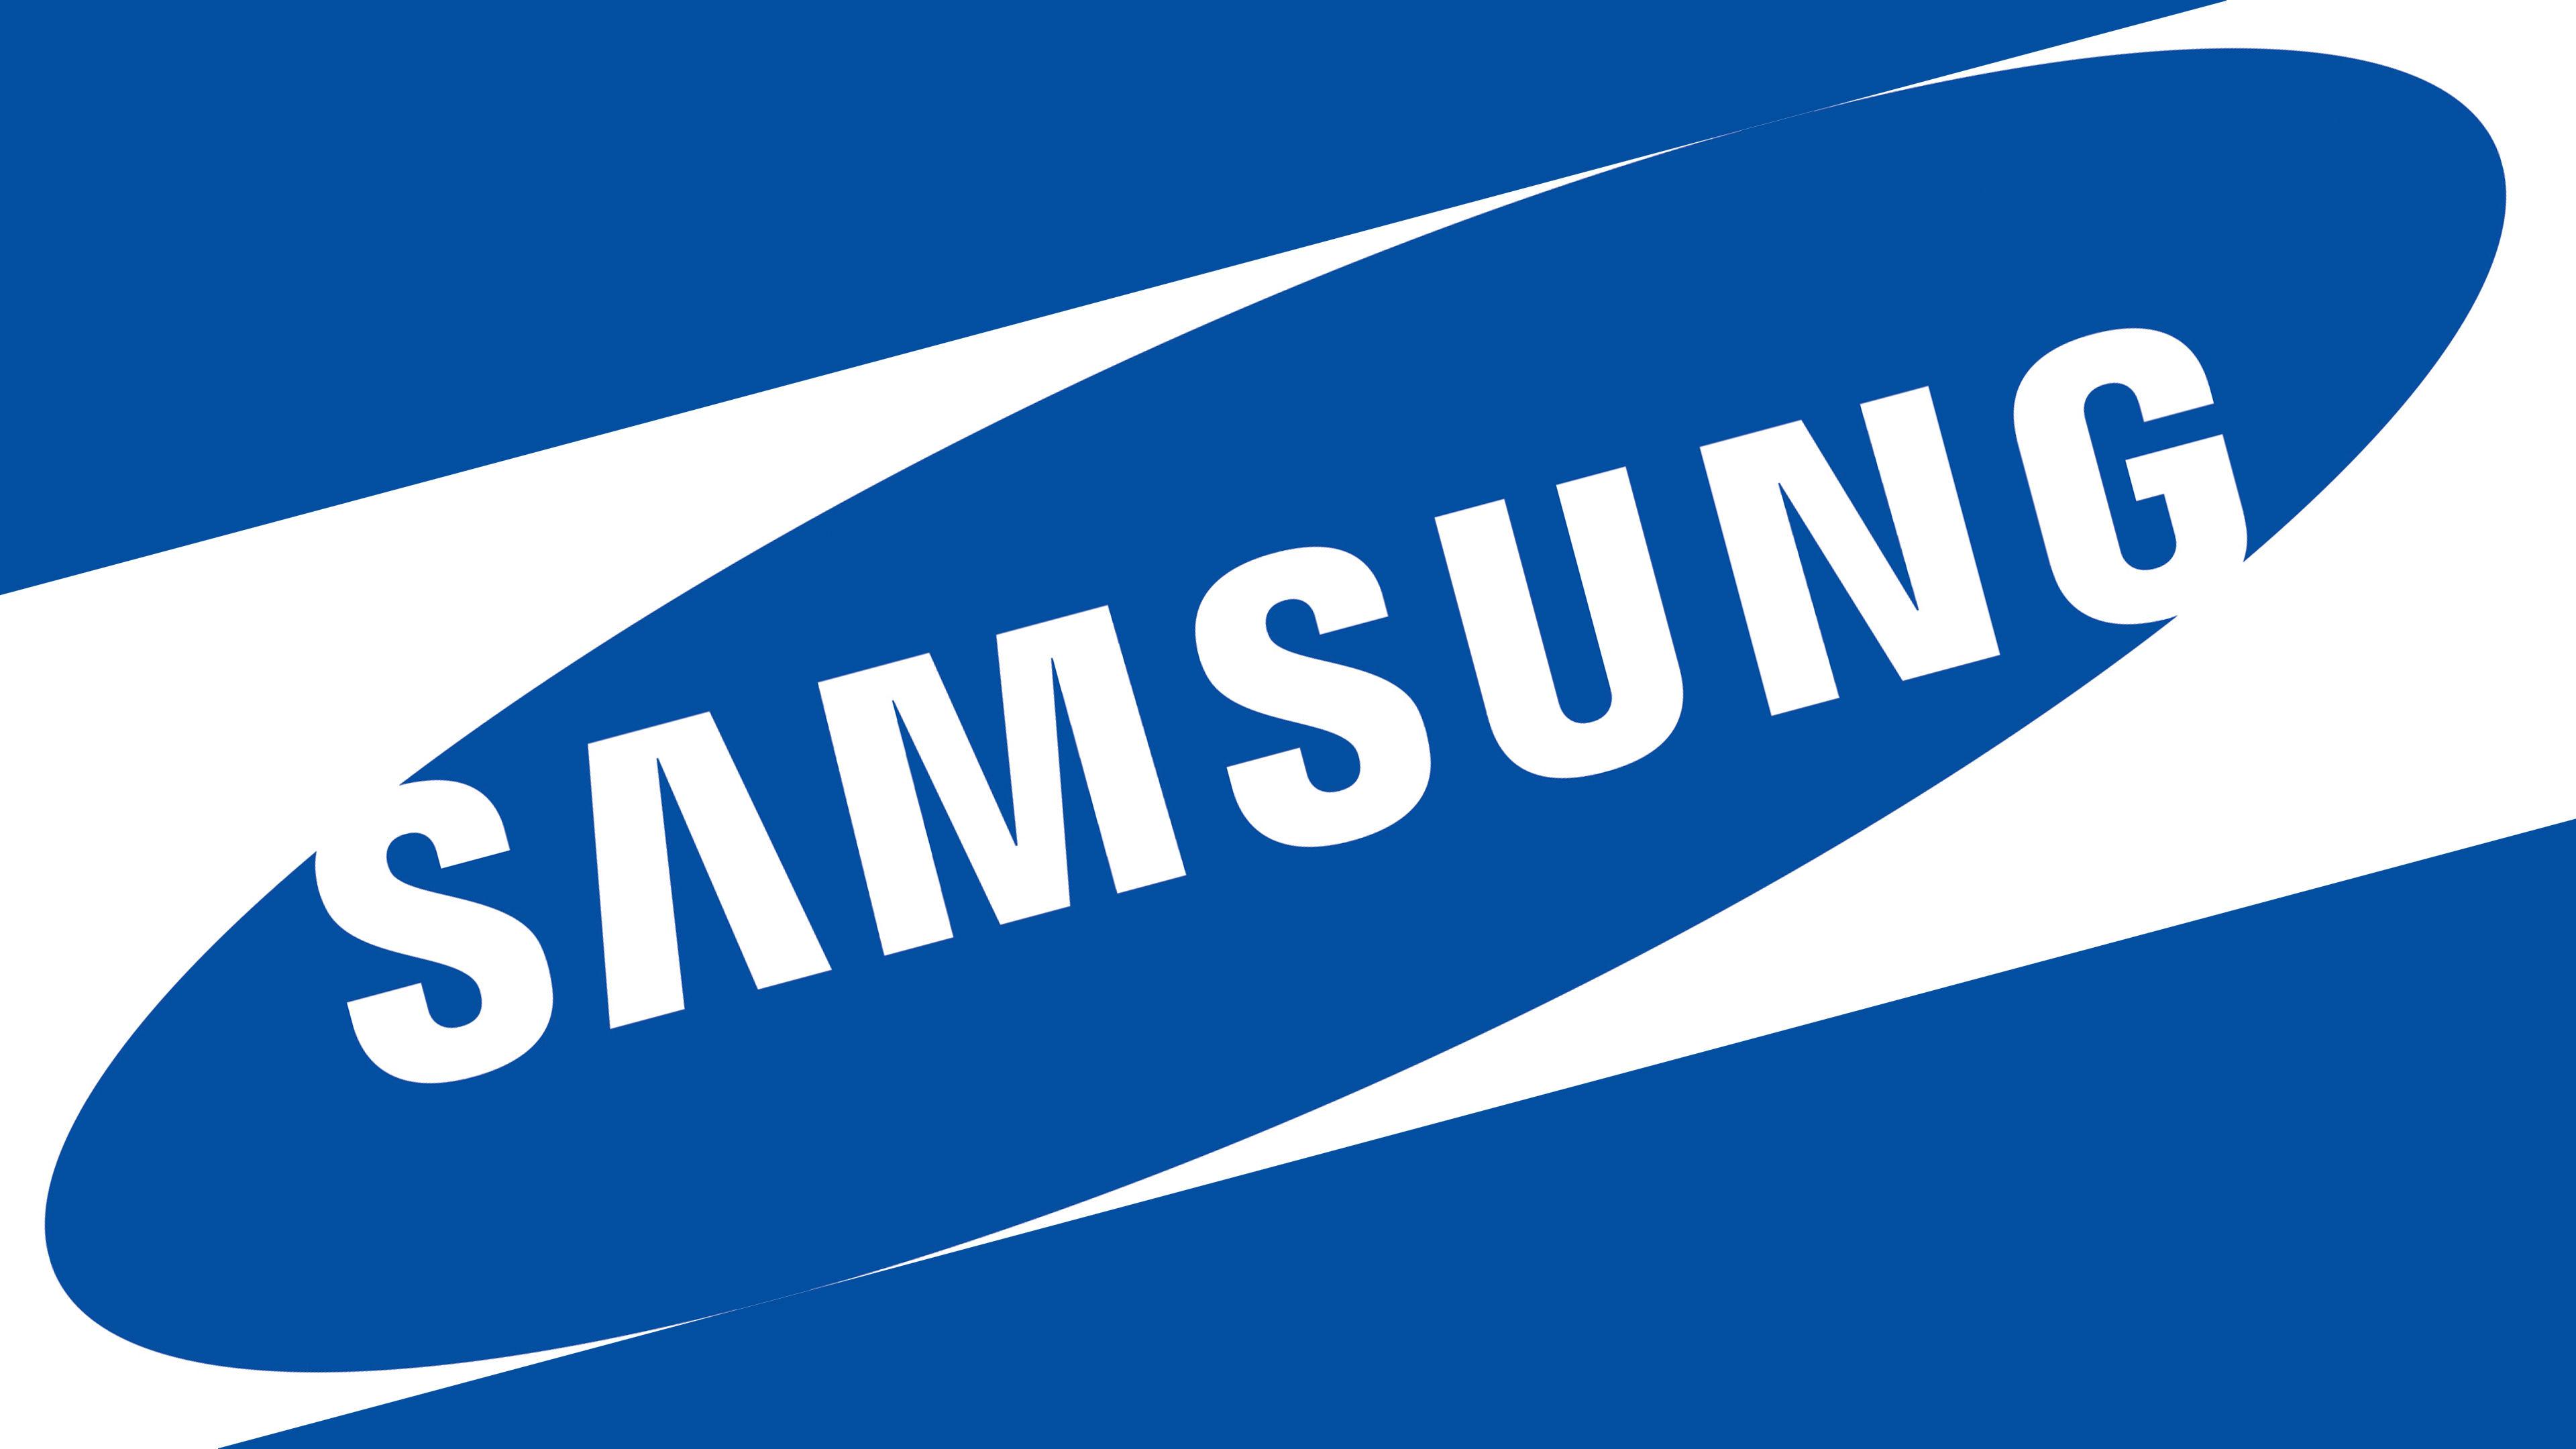 Samsung Mobile Wallpapers: Samsung Logo Wallpaper